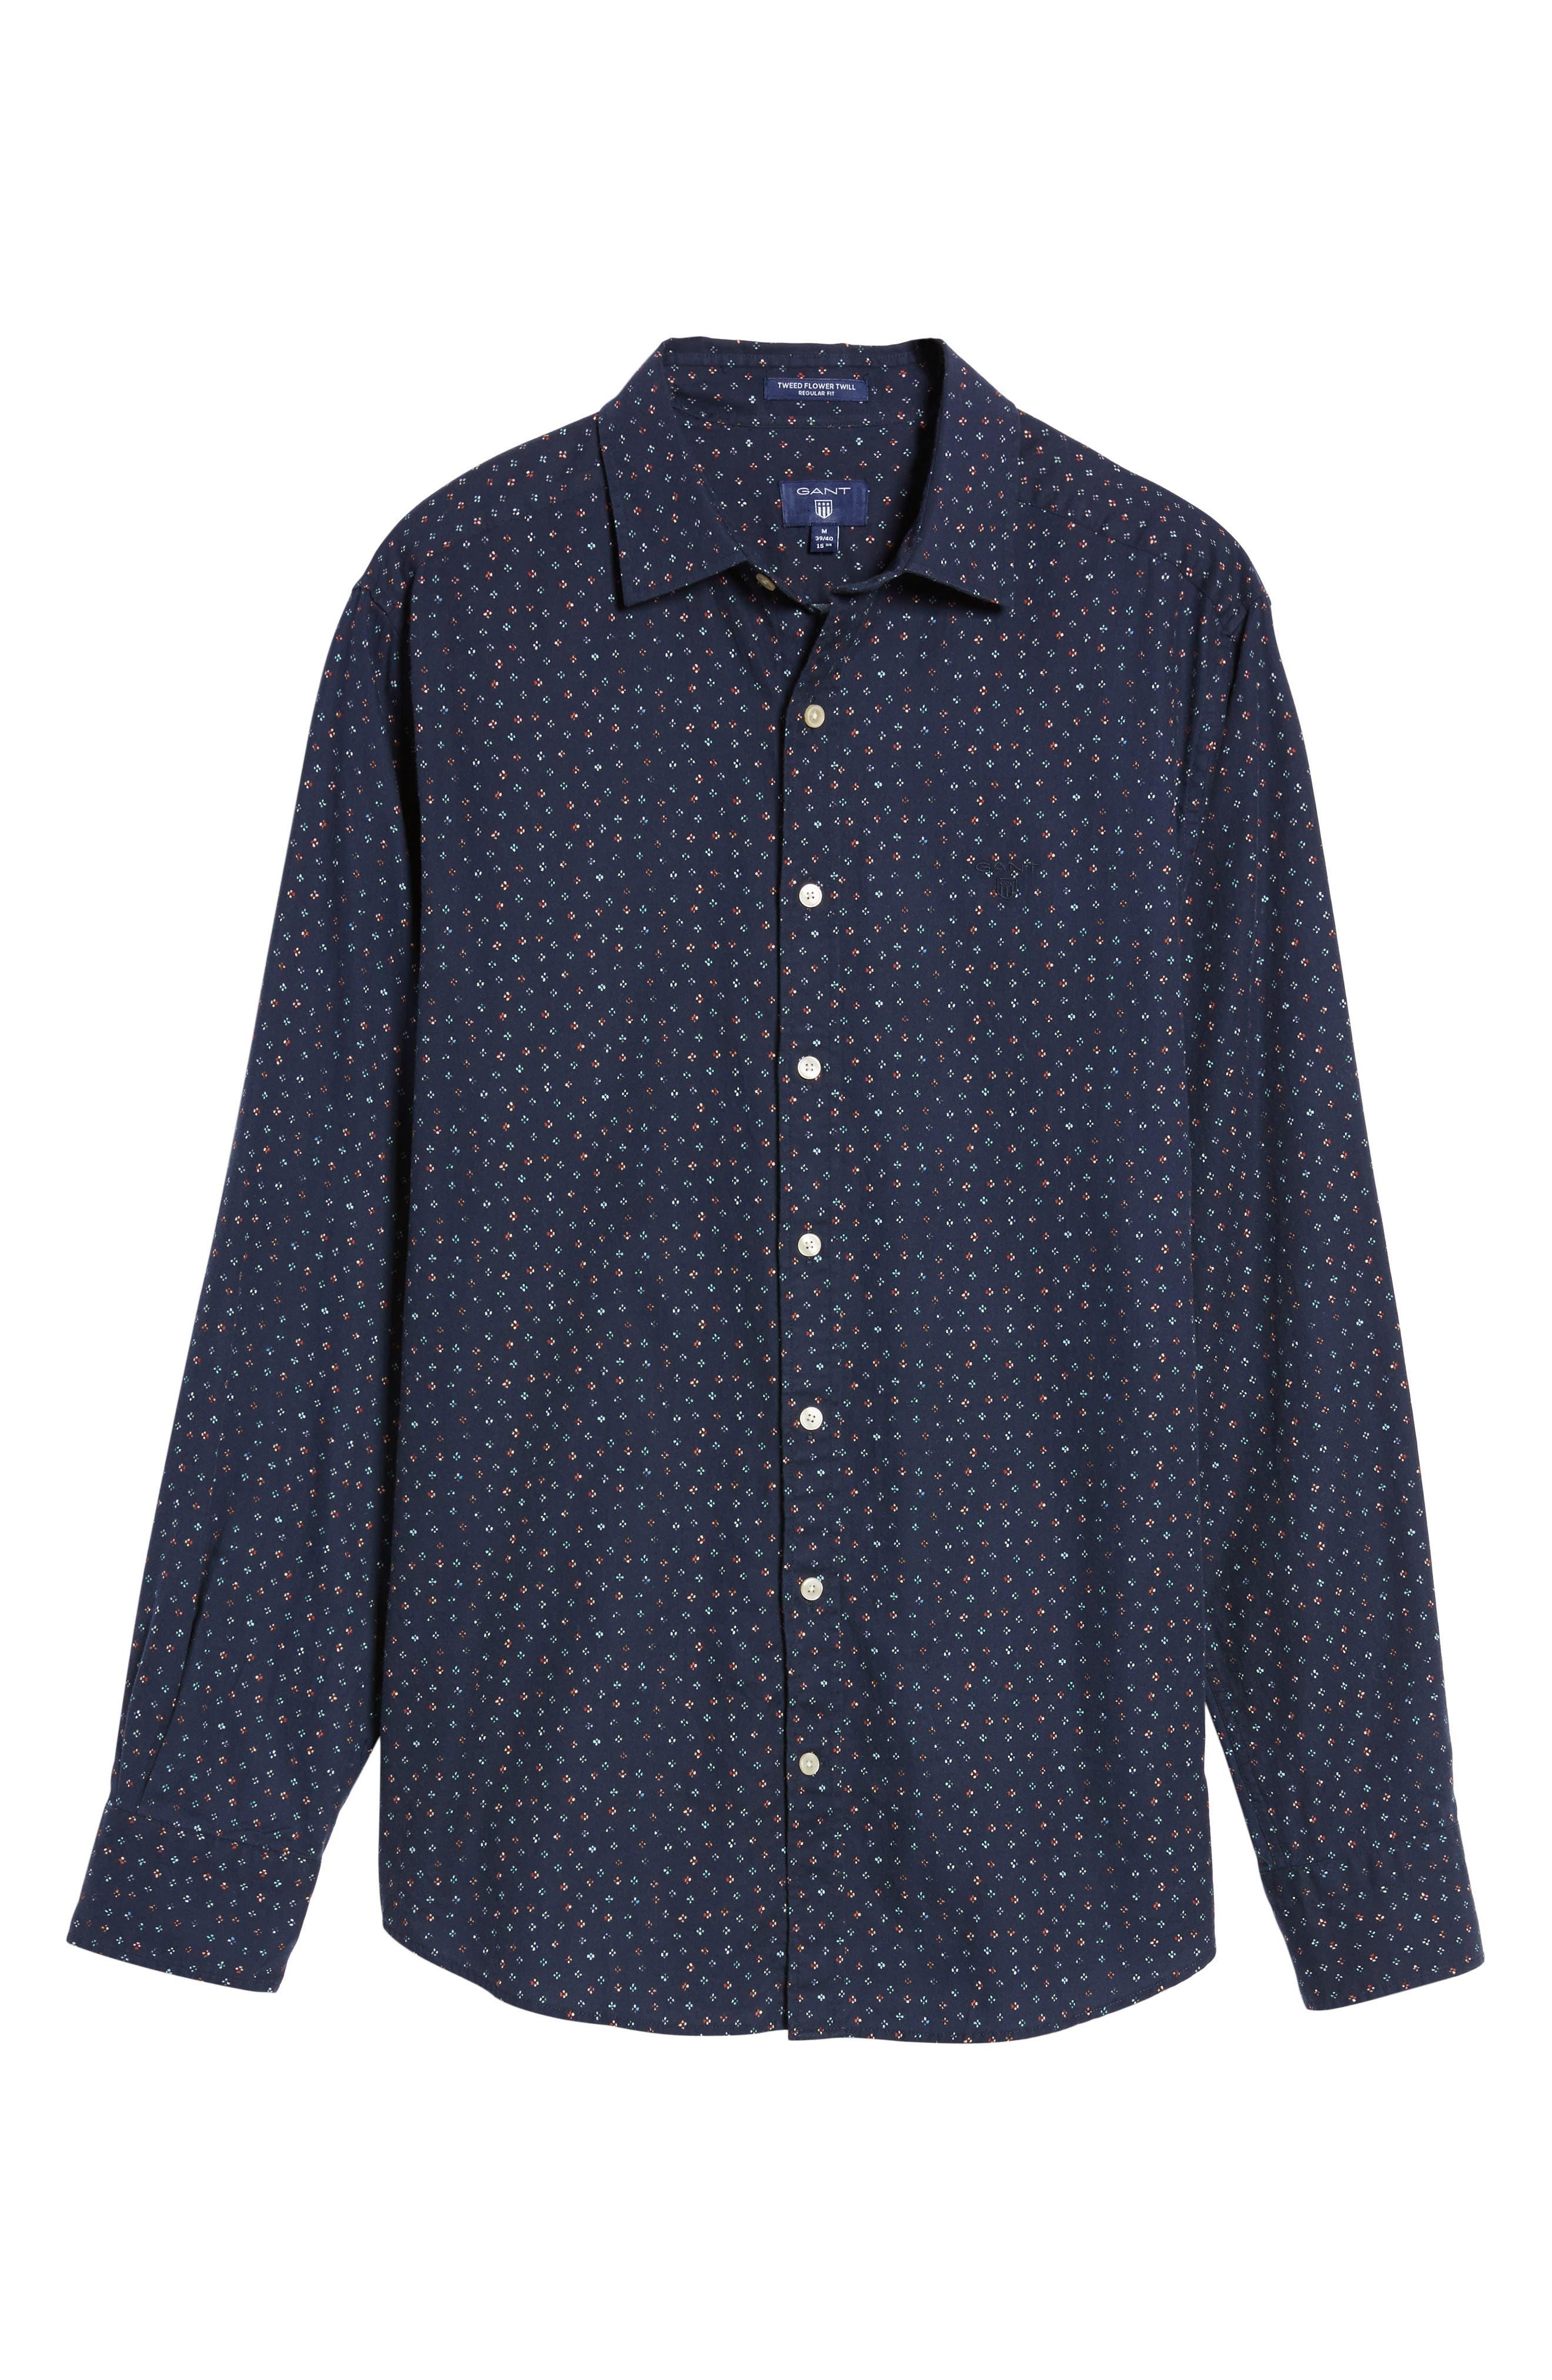 Regular Fit Floral Print Sport Shirt,                             Alternate thumbnail 6, color,                             Evening Blue